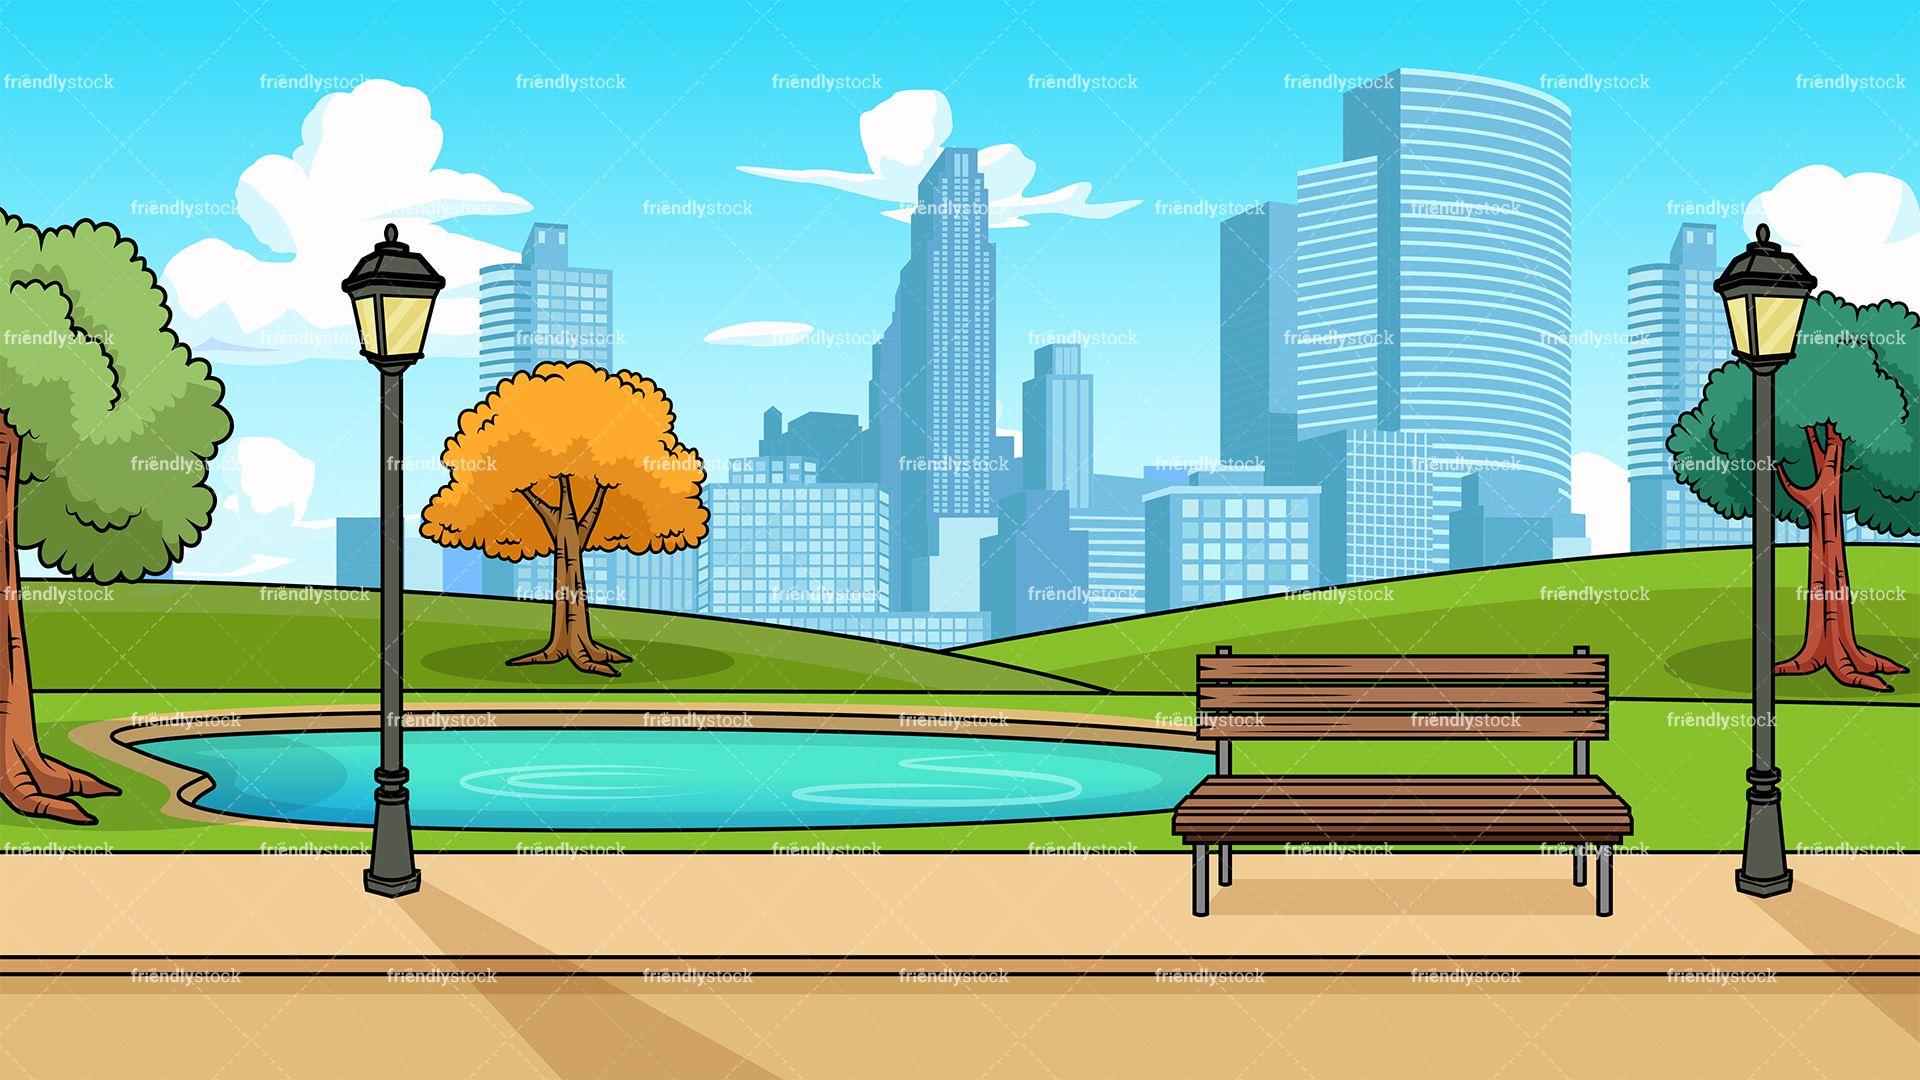 Modern City Park Background Cartoon Clipart Vector   FriendlyStock 1920x1080